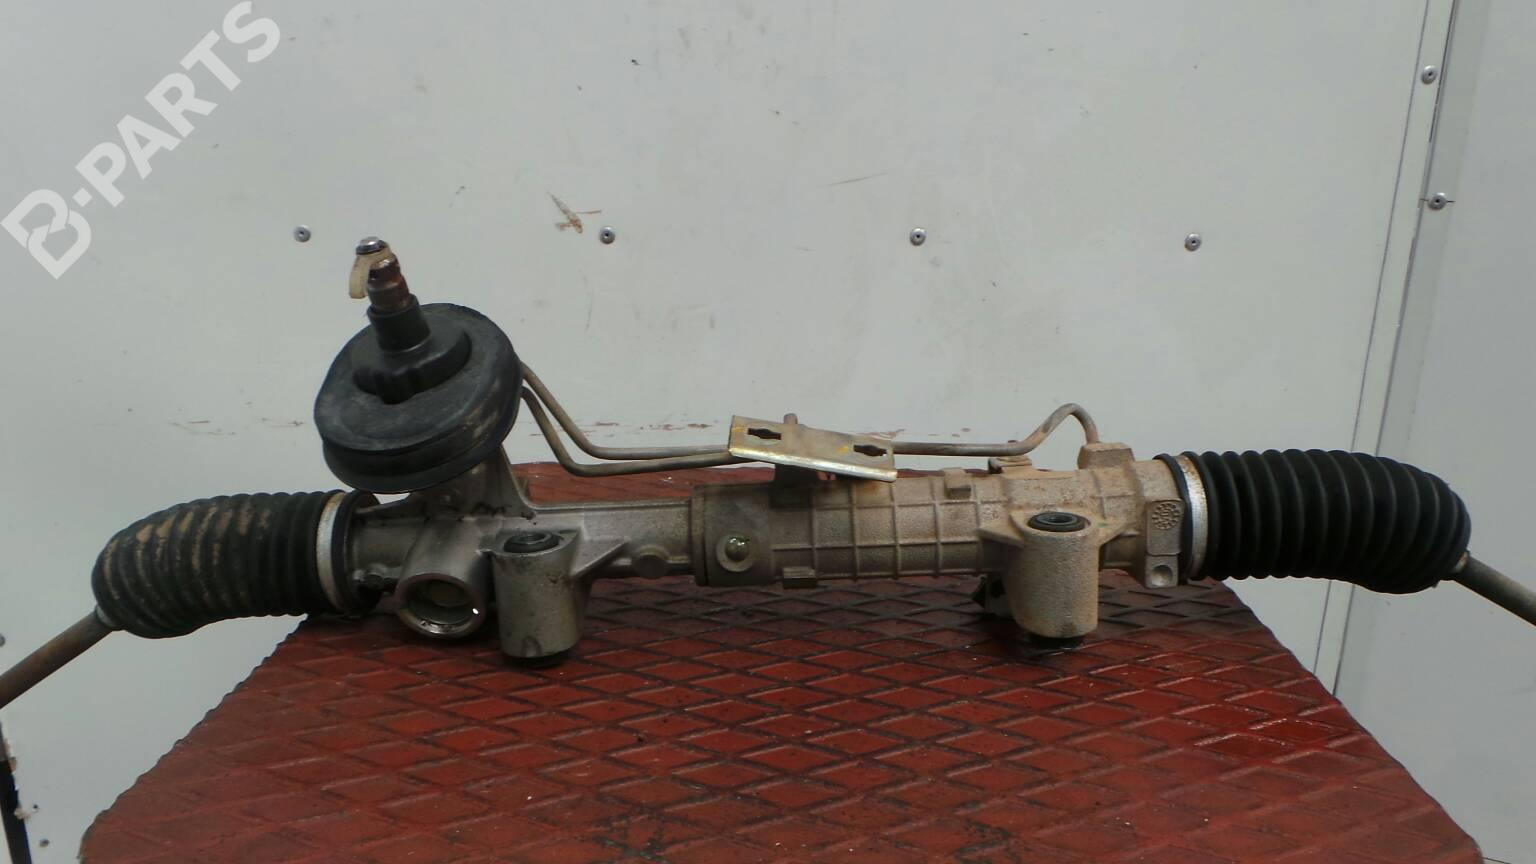 FIAT PUNTO II HATCHBACK 1.2 80HP 1999-2006 Exhaust Central Silencer